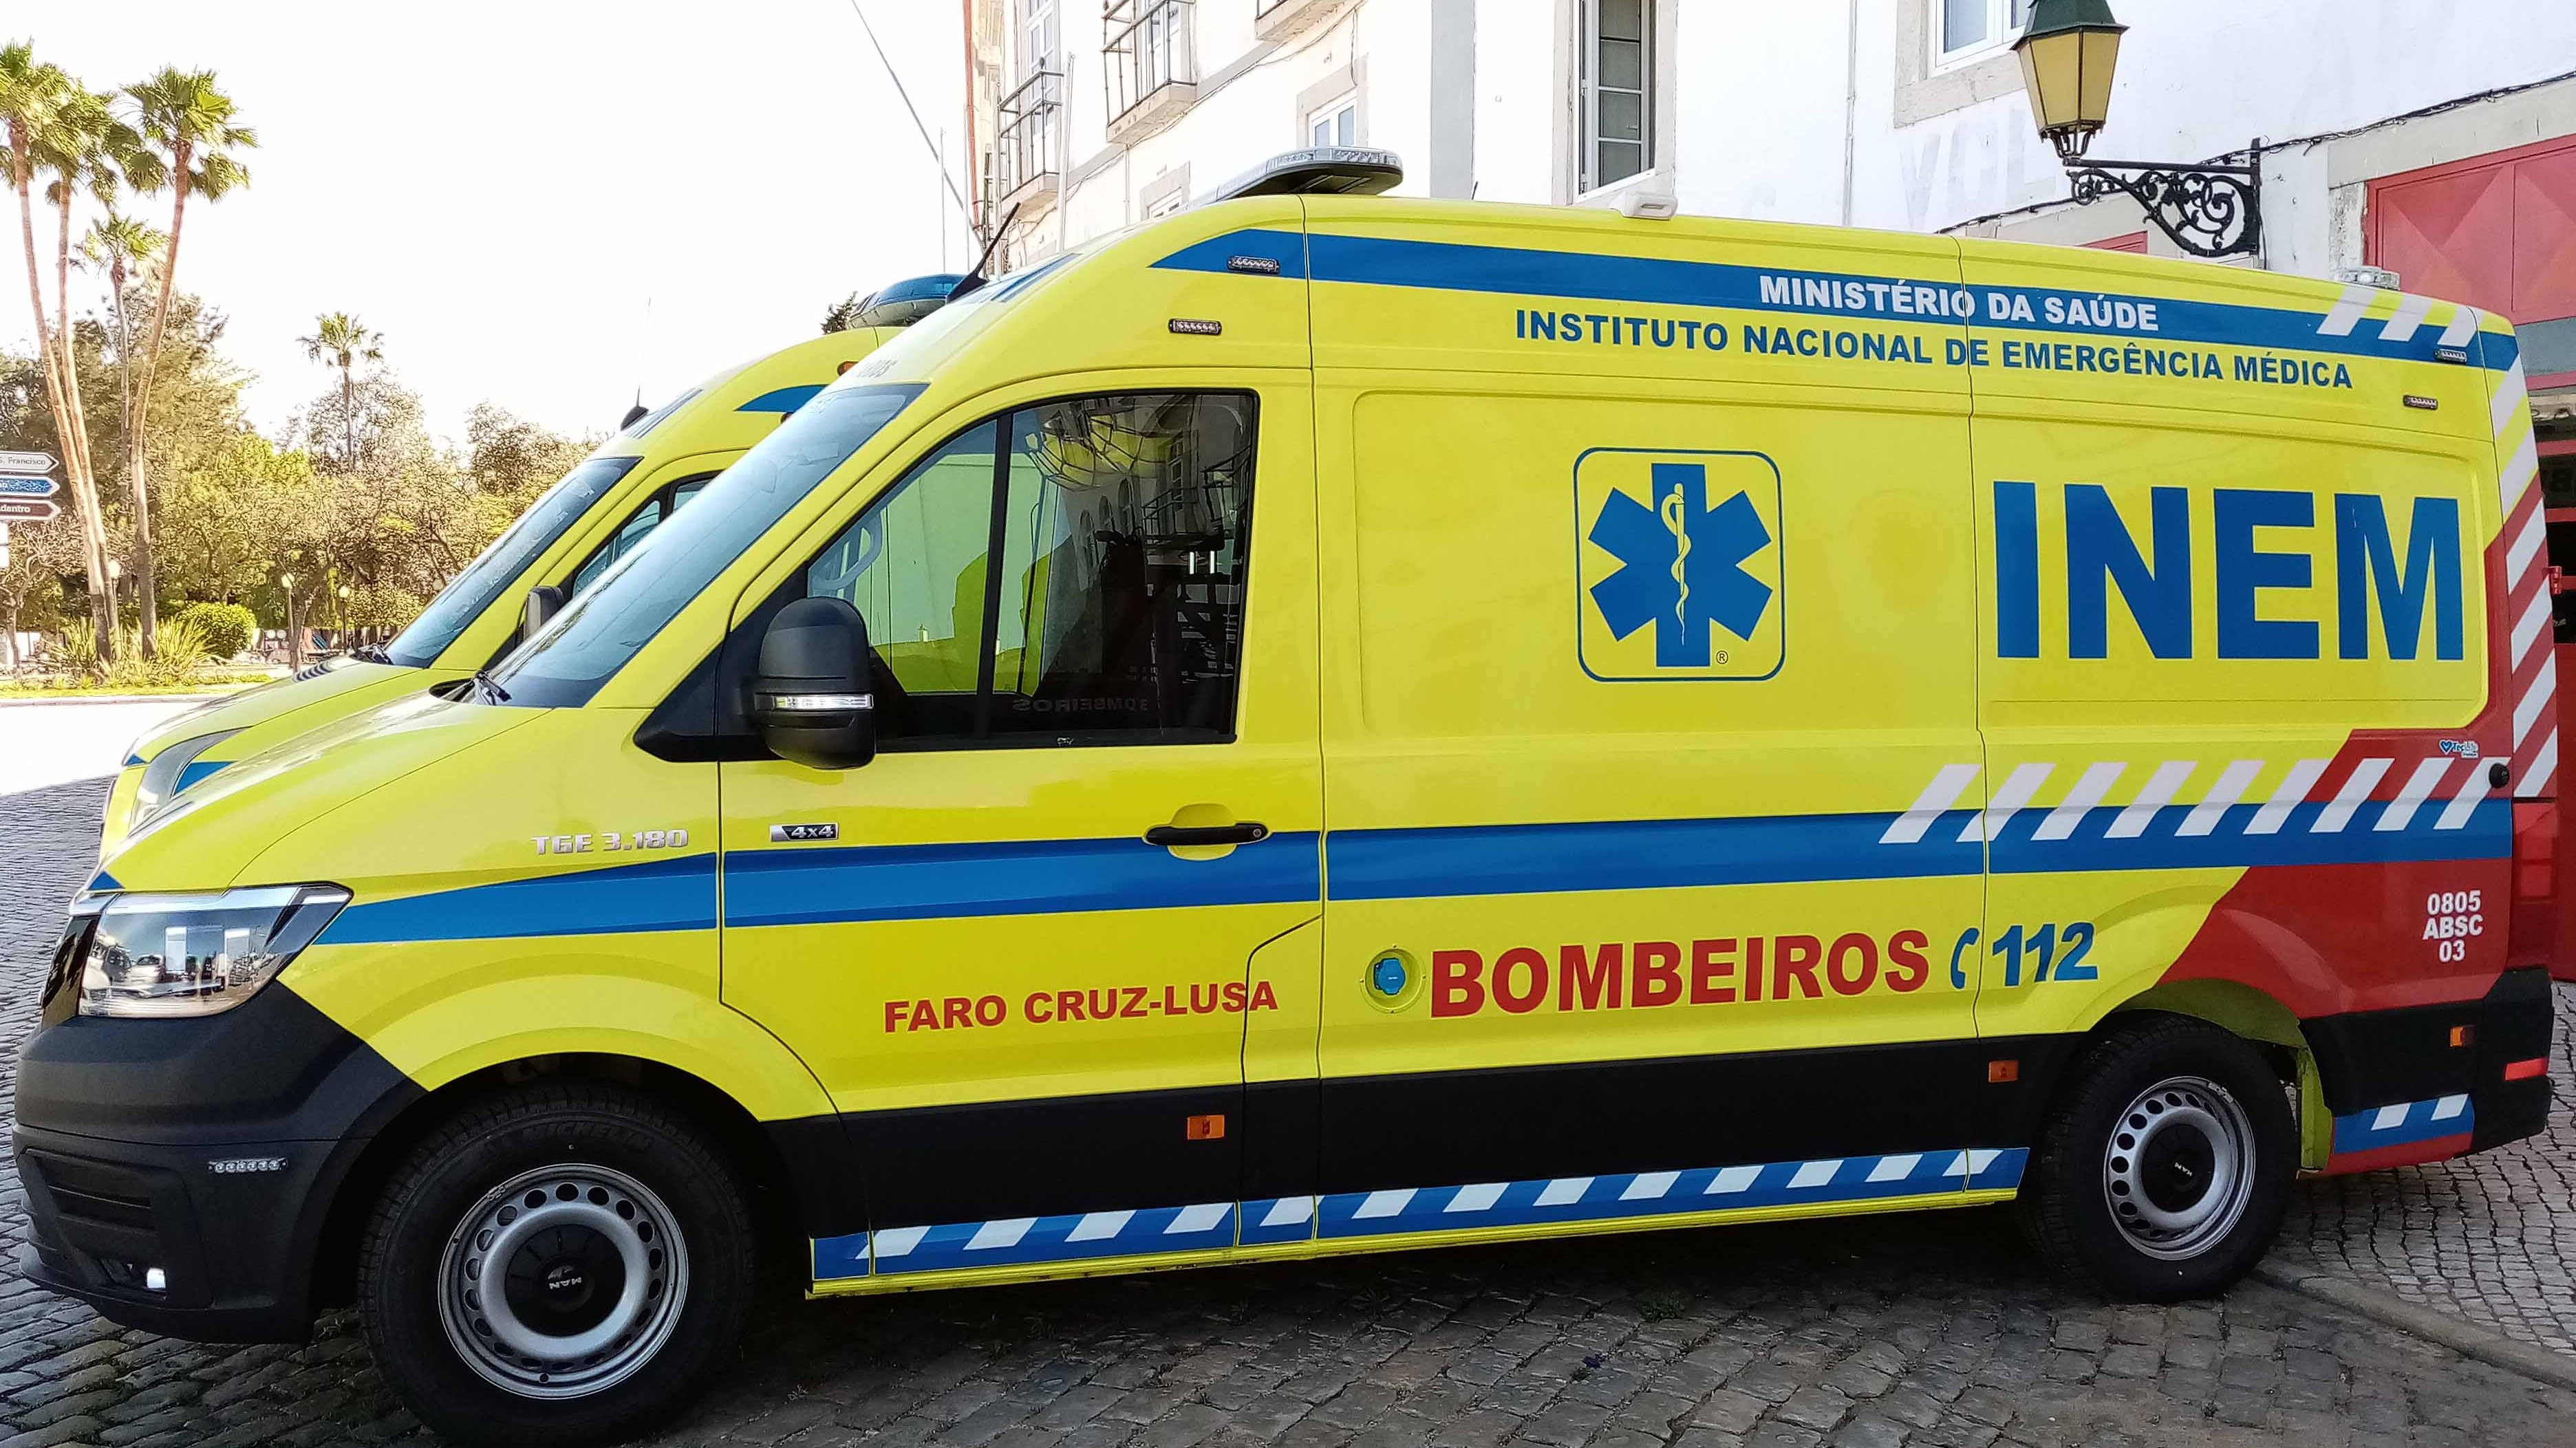 Portuguese Ambulance Land Vehicle Scene In Faro Algarve Portugal Europe